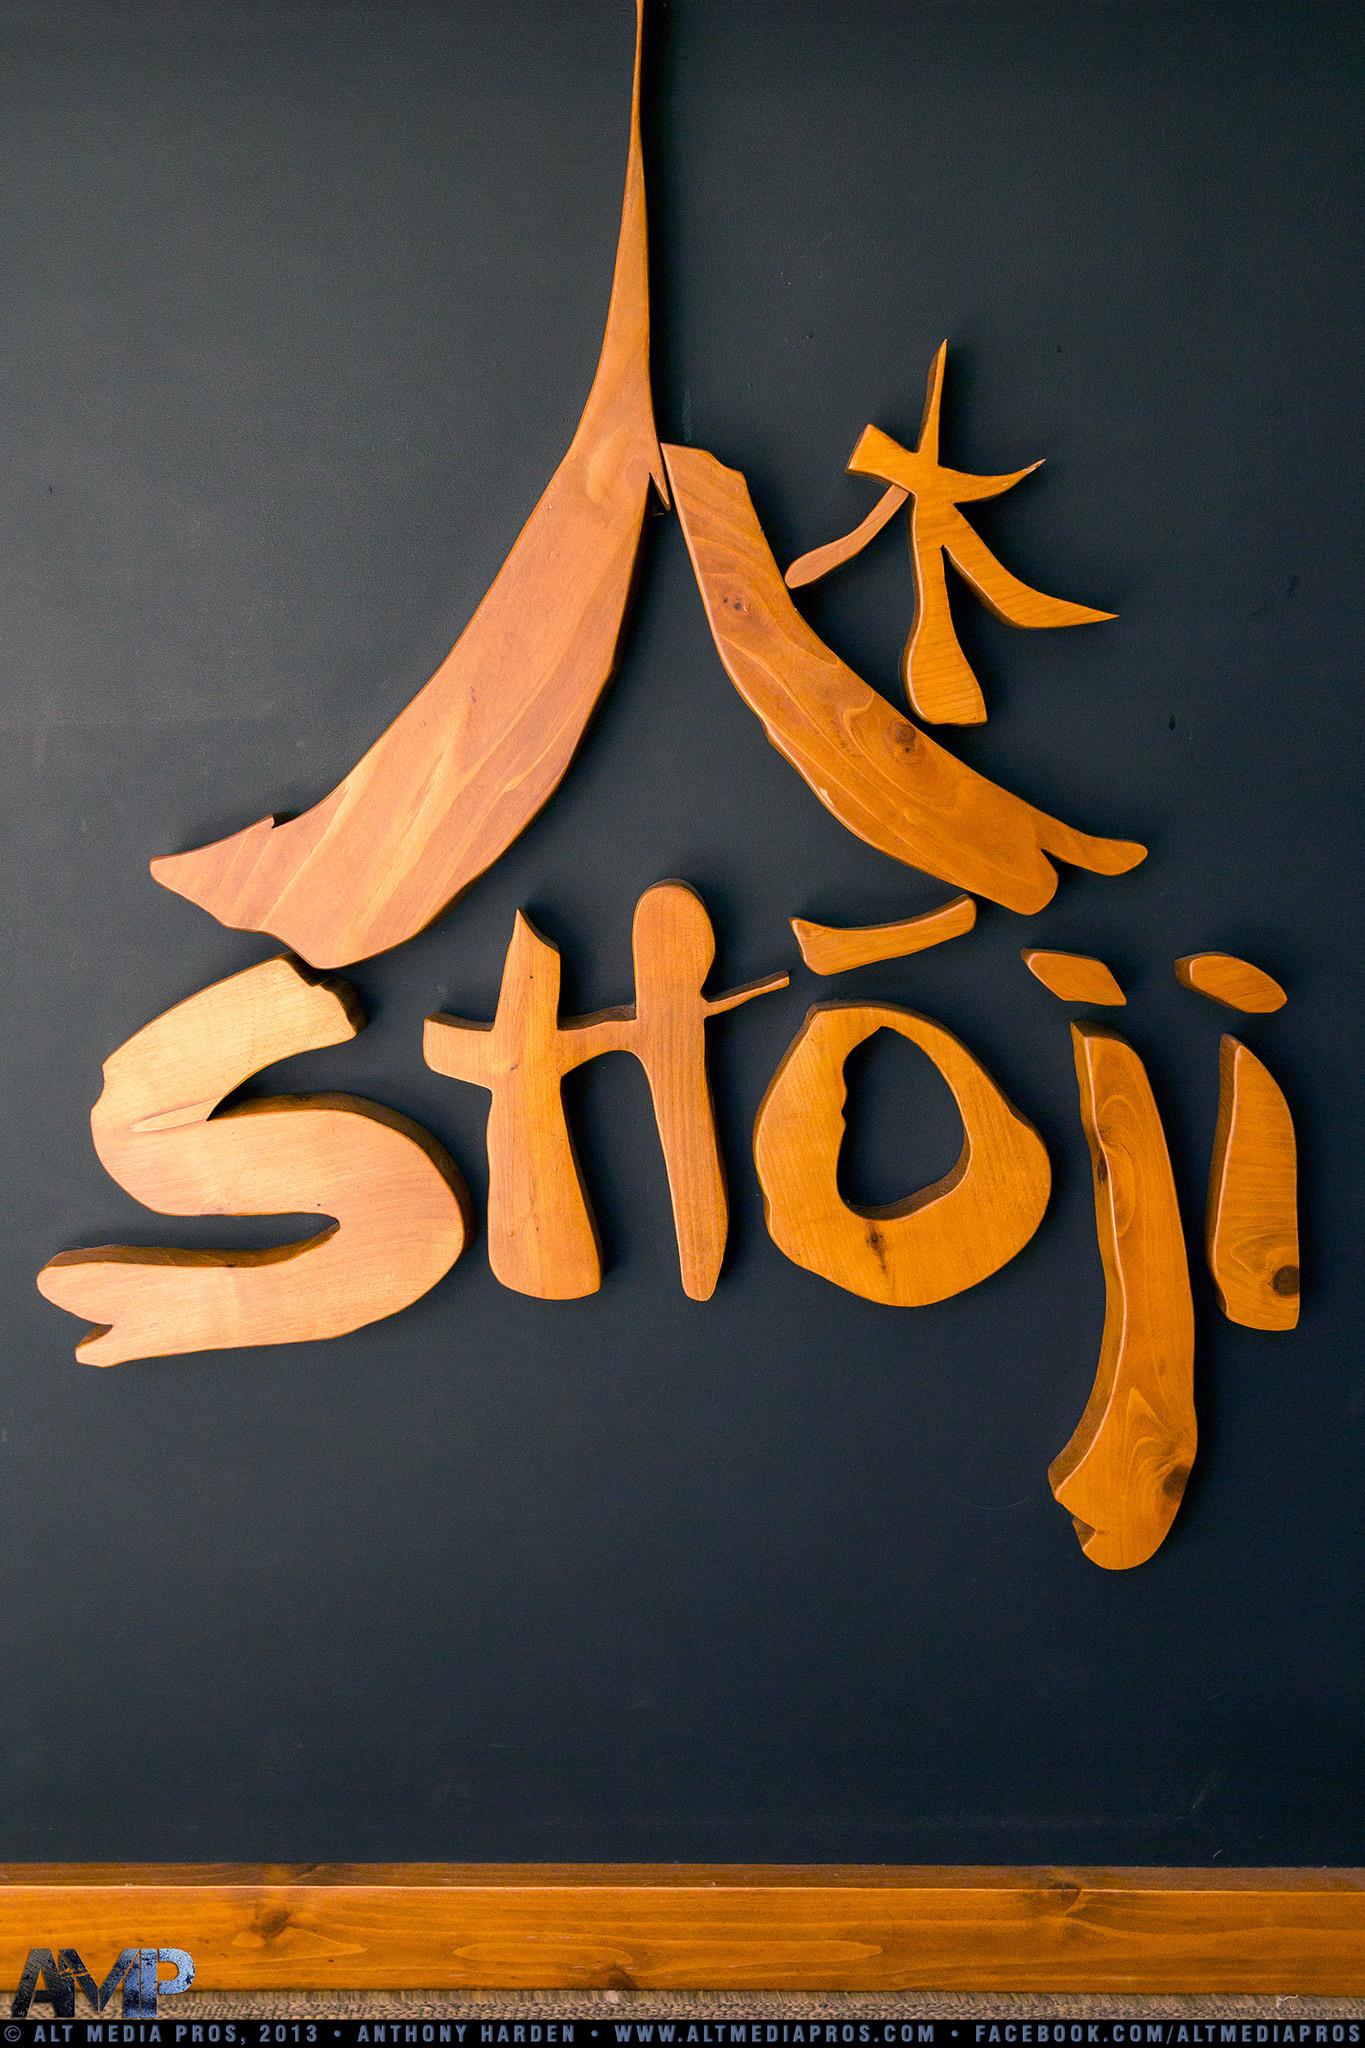 Shoji_PSD_051413_002.jpg